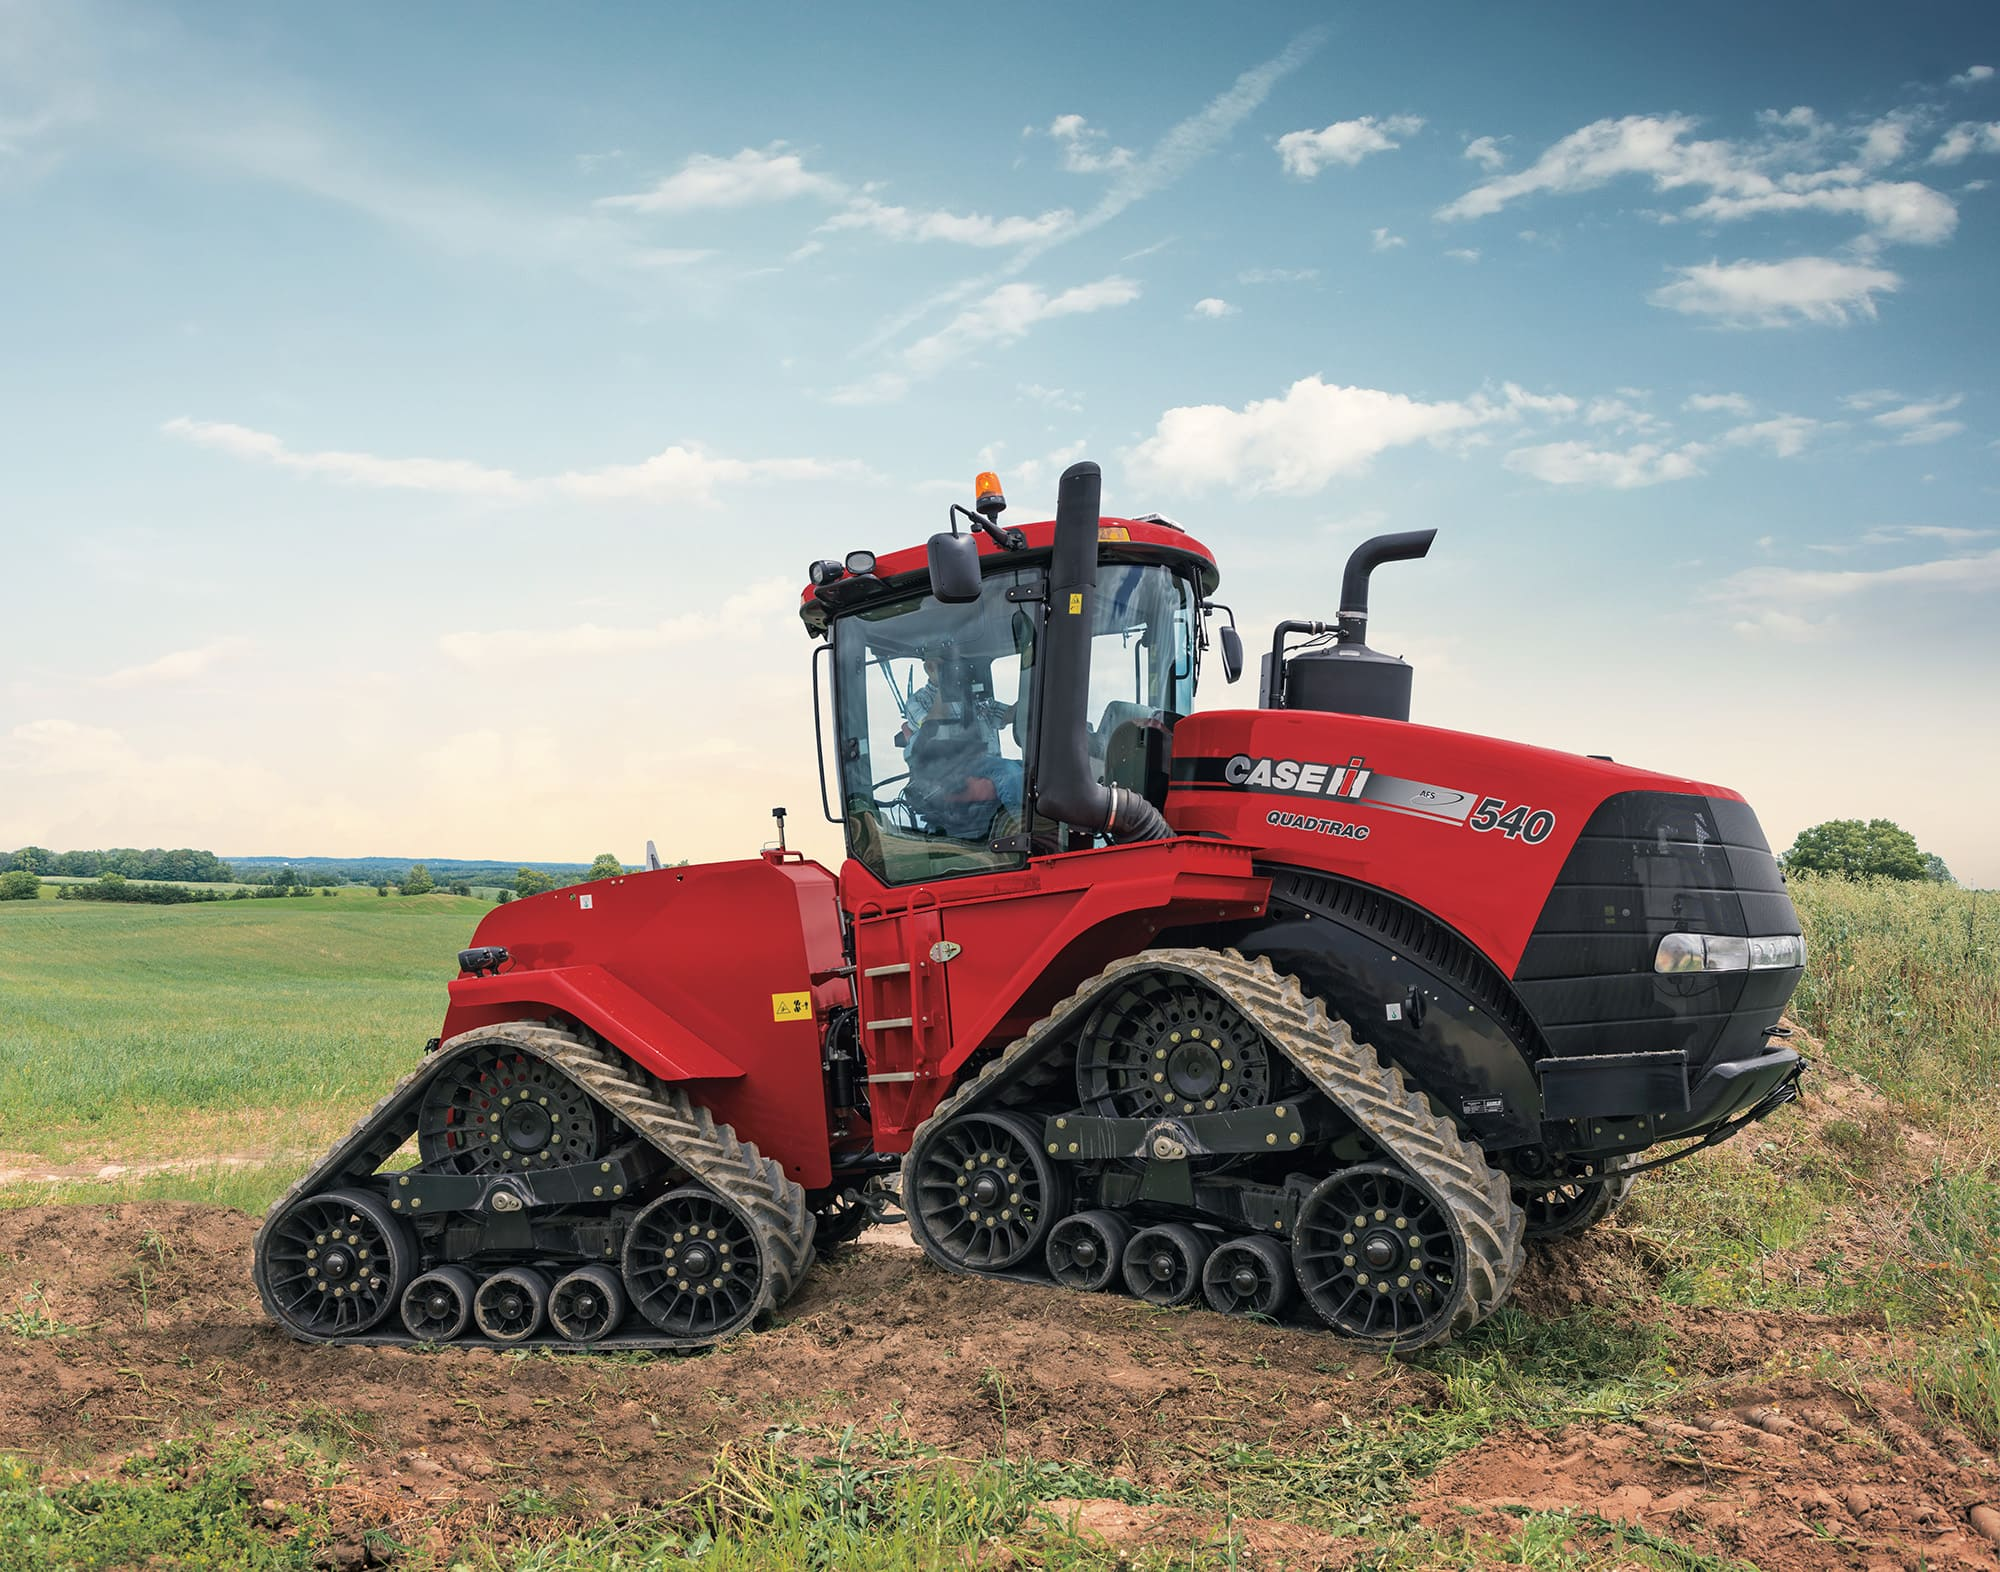 steiger_quadtrac_540_0713_mim 0576?width=1280&height=562 steiger series 4wd row crop farming tractors case ih  at gsmx.co